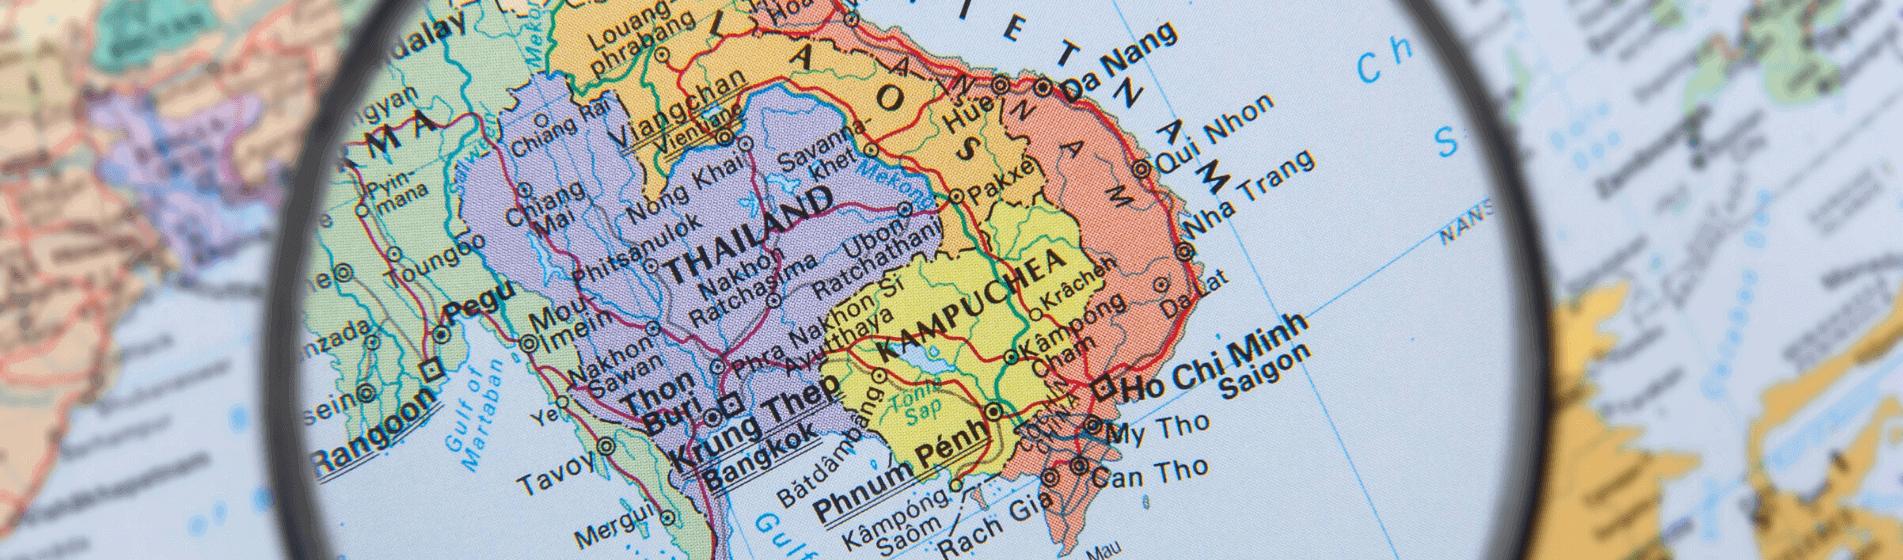 Six reasons serious entrepreneurs should consider Southeast Asia